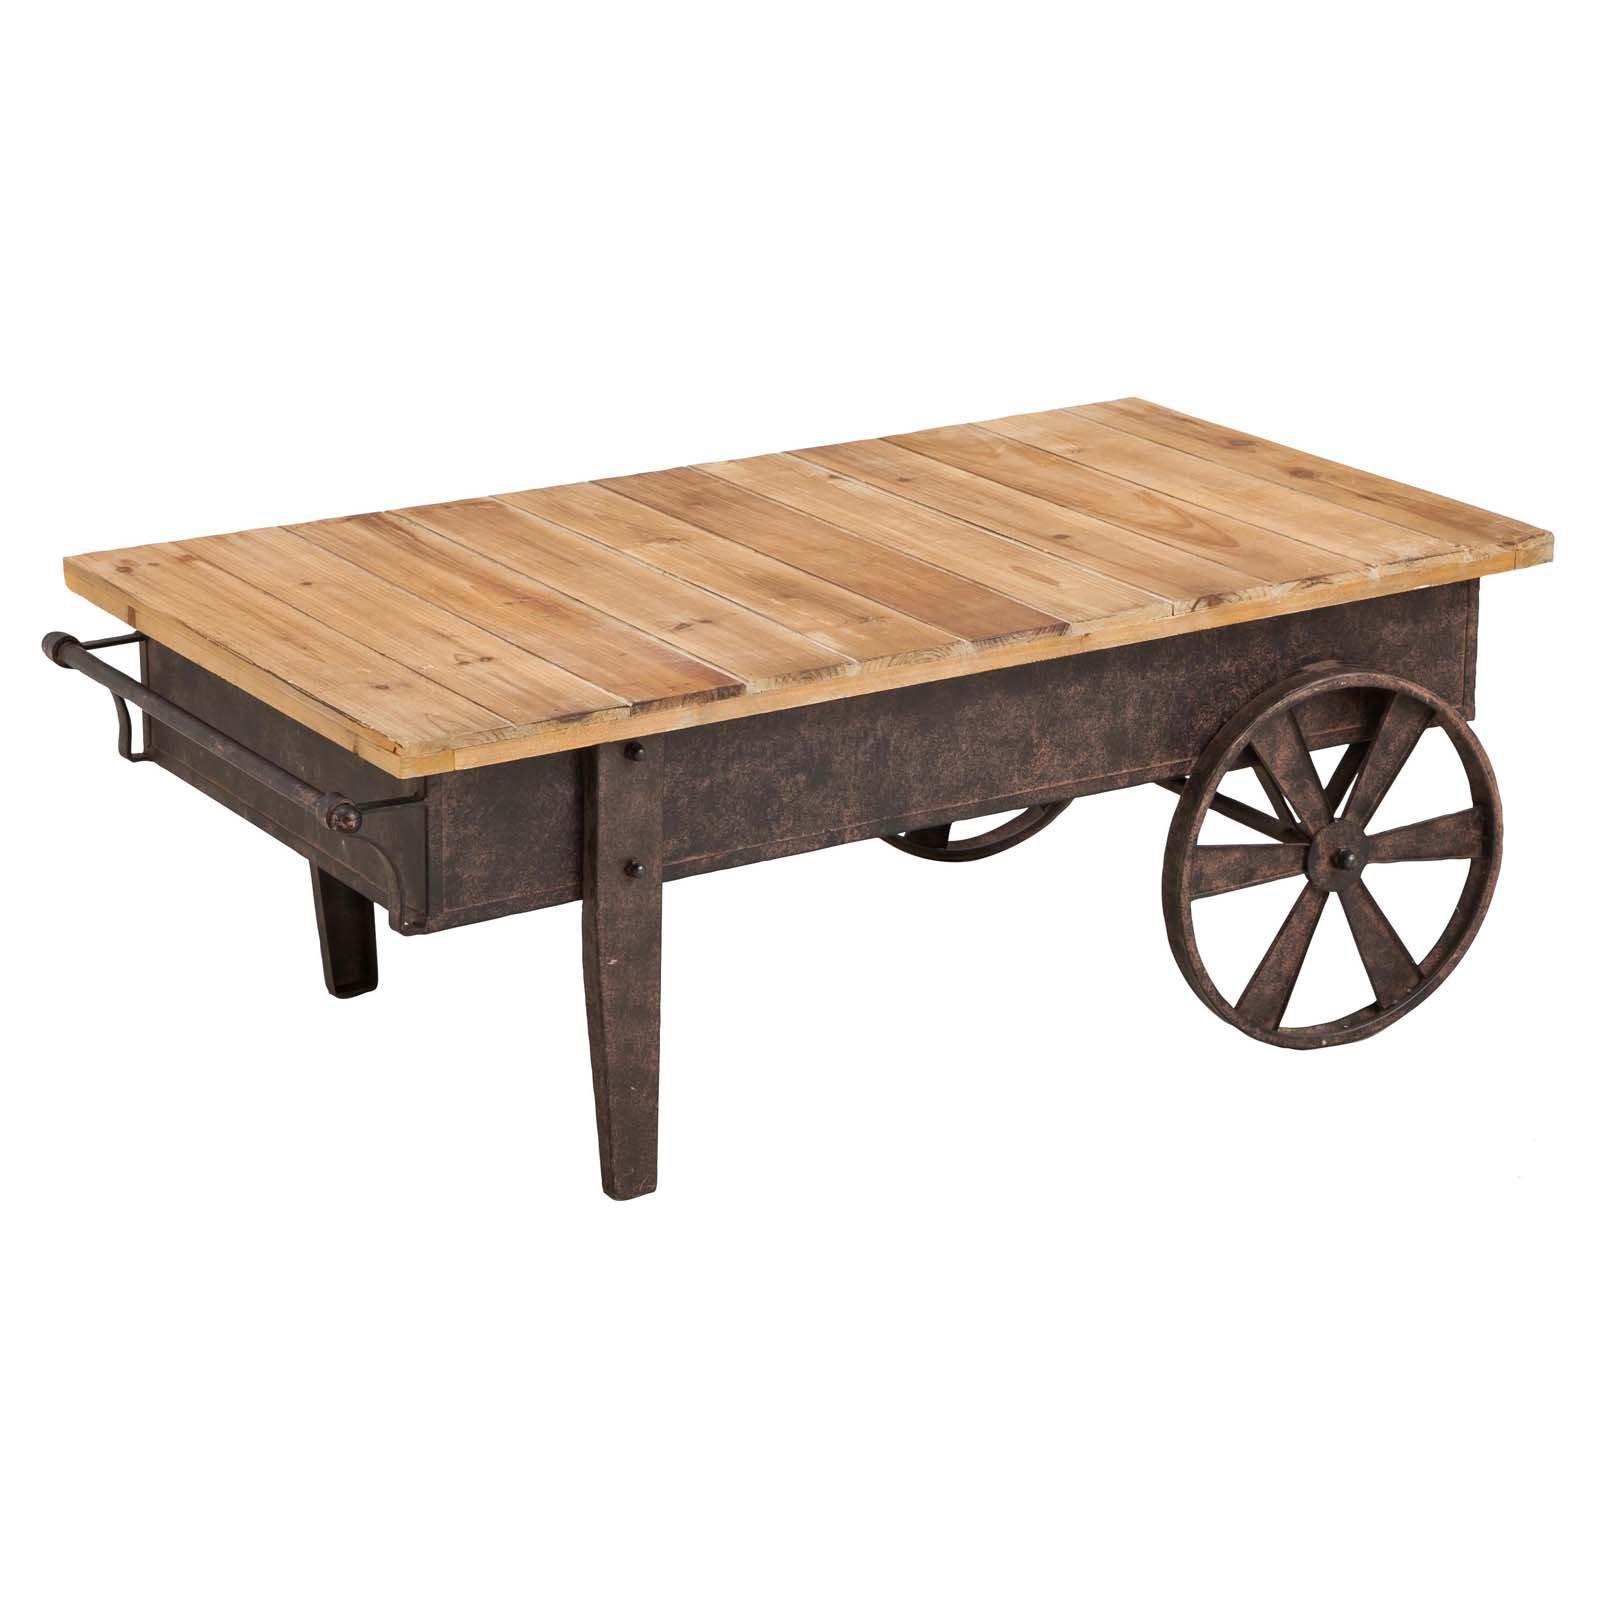 Evergreen Enterprises Vintage Wood Plank and Metal Cart